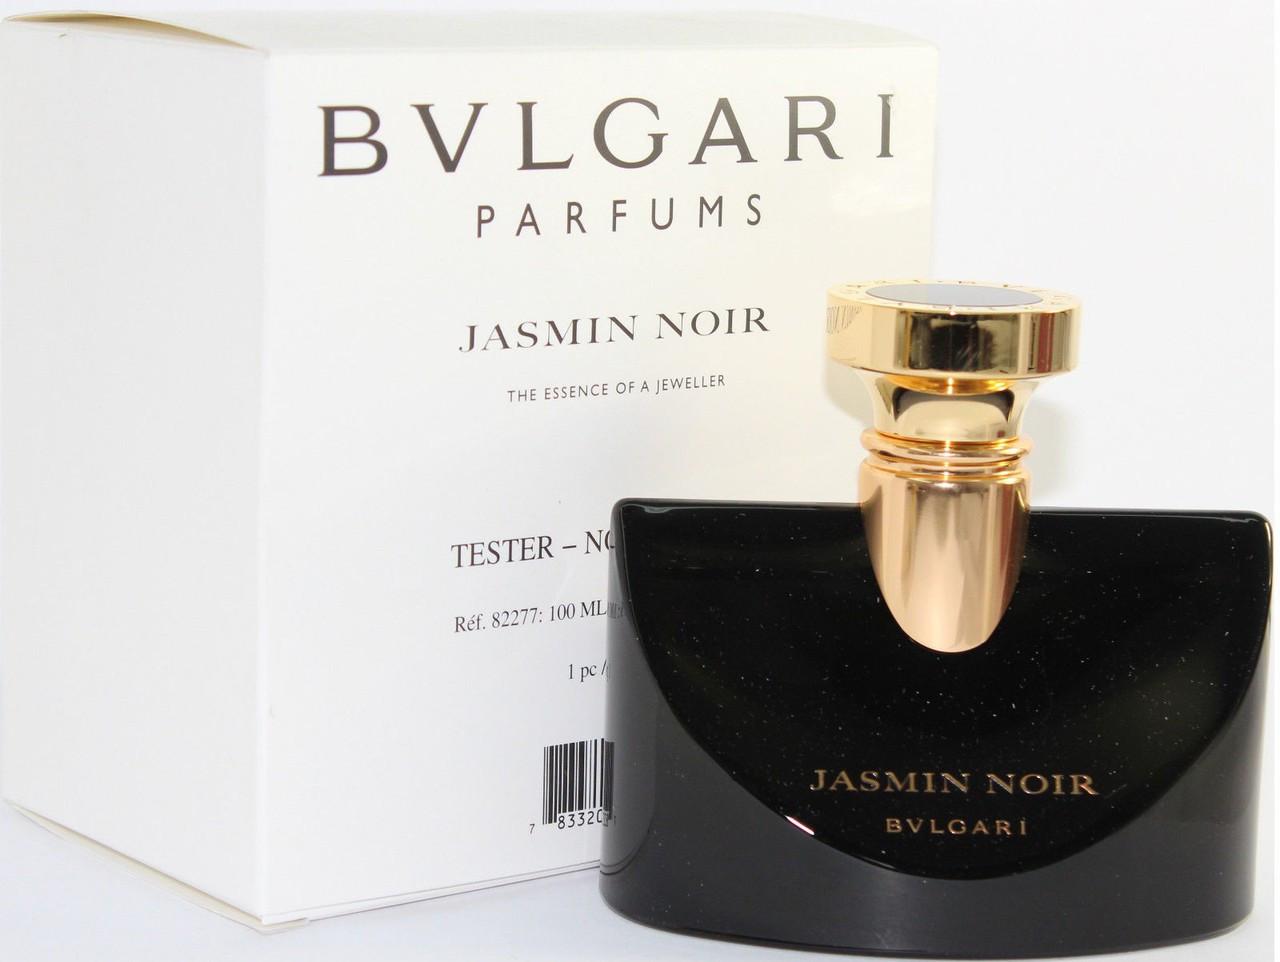 BVLGARI JASMIN NOR (100ML) EDP - TESTER - Perfume Forever Online Store 75f21f8712c